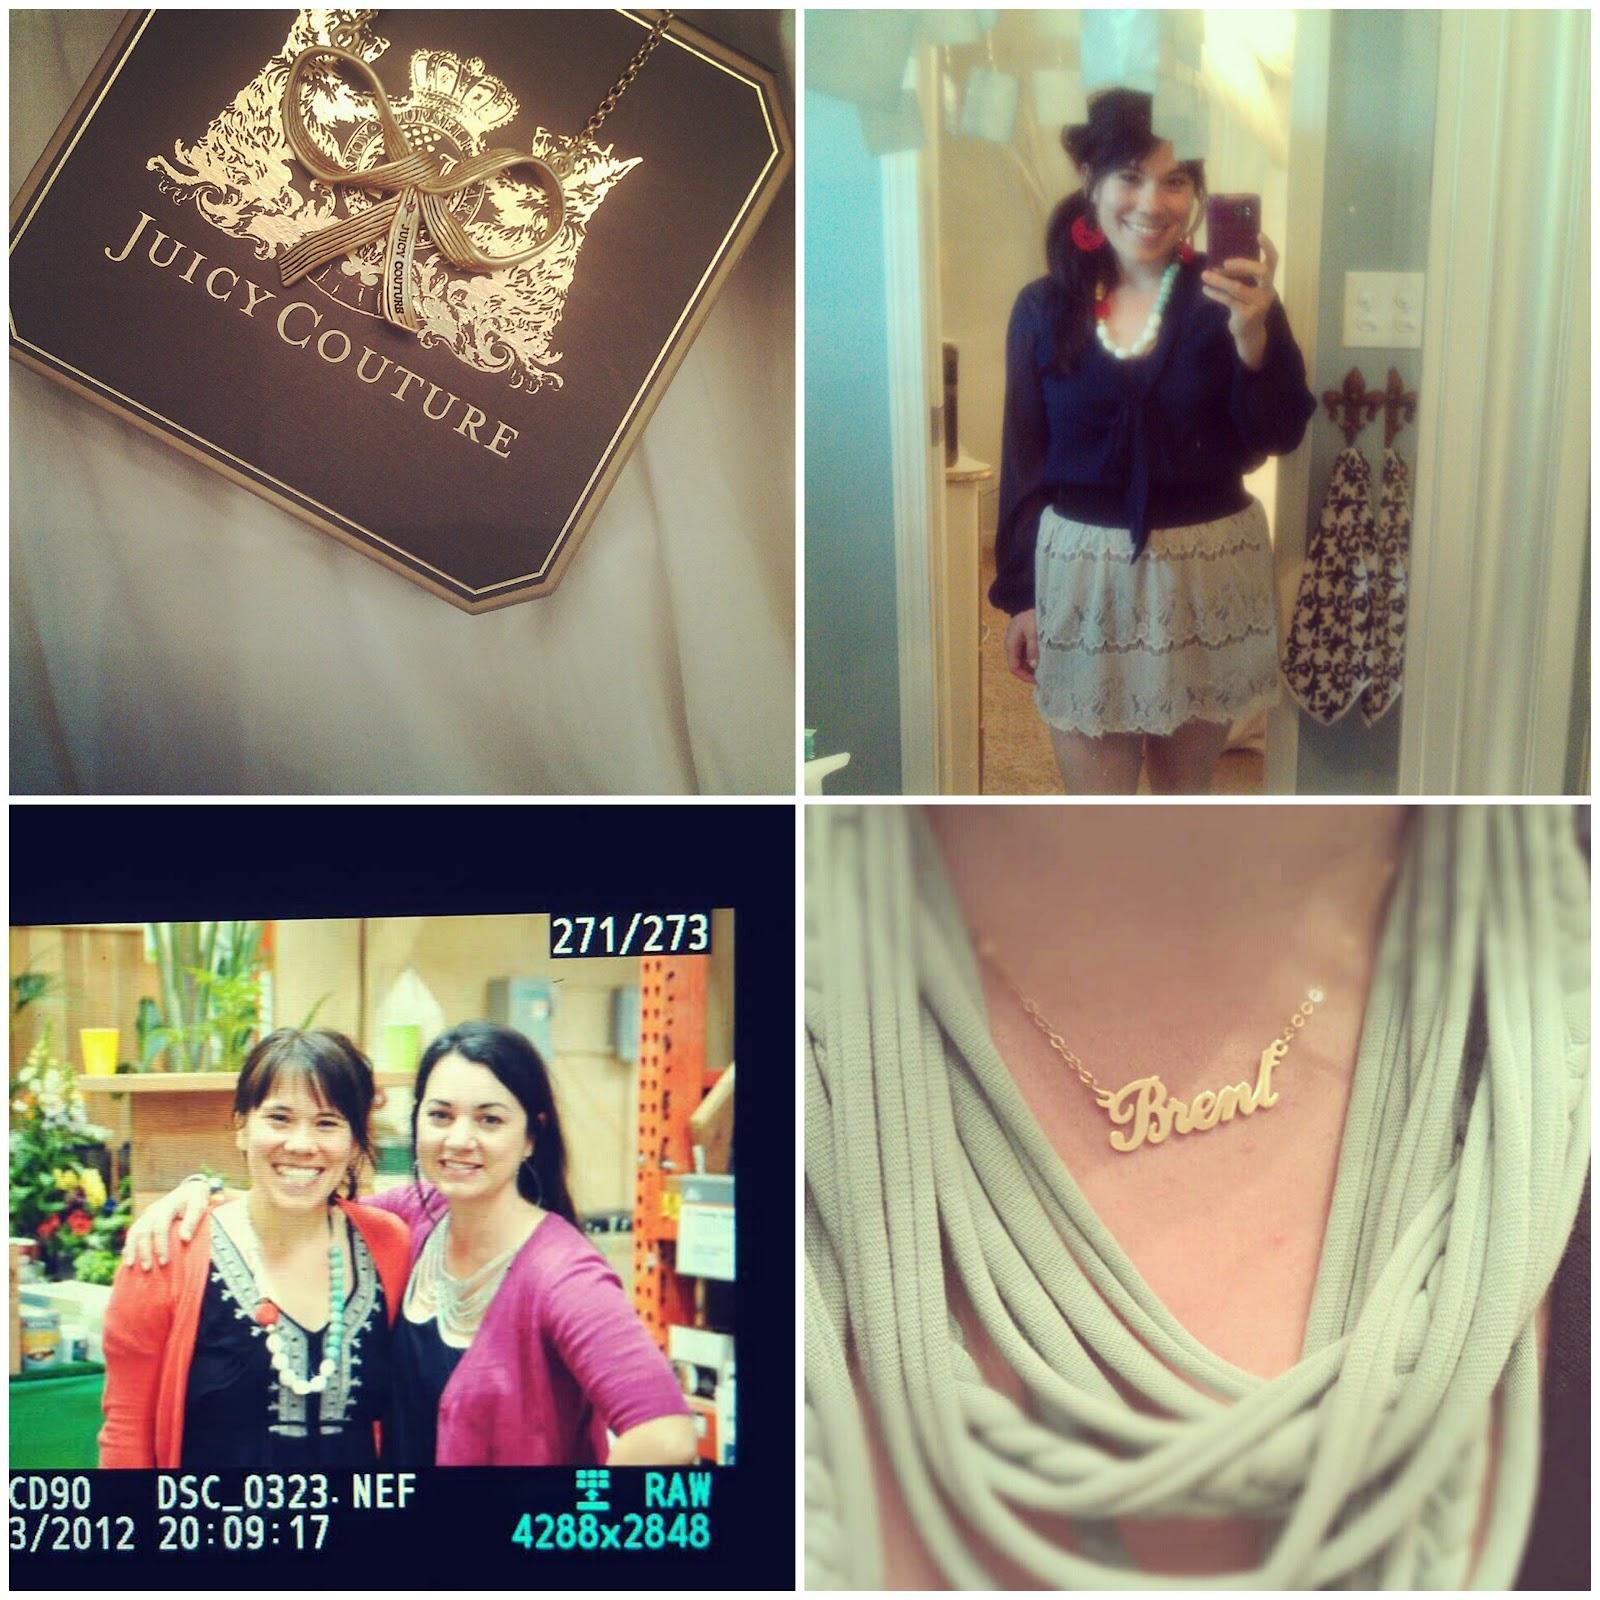 http://4.bp.blogspot.com/-axMWKkAKPaY/T6iQS5c6v1I/AAAAAAAAMdQ/l52TJ7f2vPQ/s1600/What+I+have+been+wearing-instagram.jpg